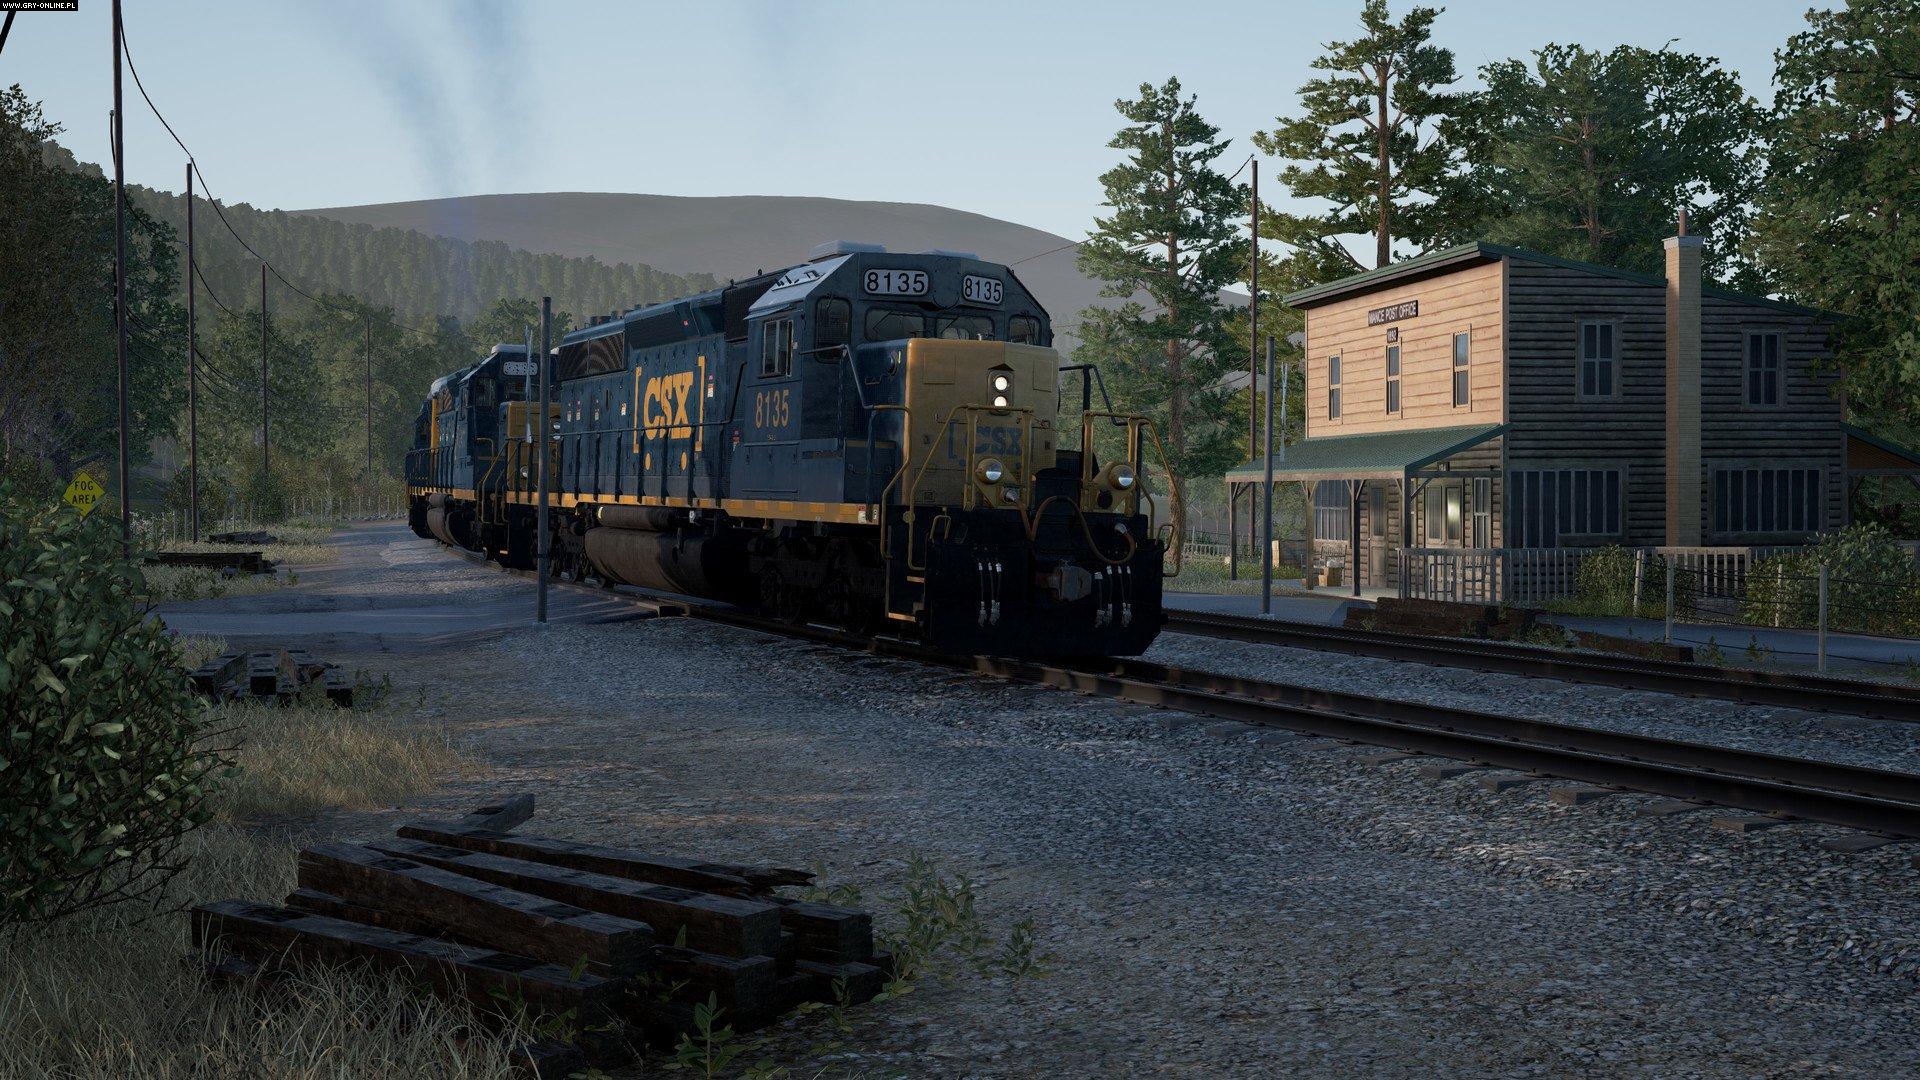 Train Sim World: CSX Heavy Haul PC, XONE Games Image 5/8, Dovetail Games/Rail Simulator Developments